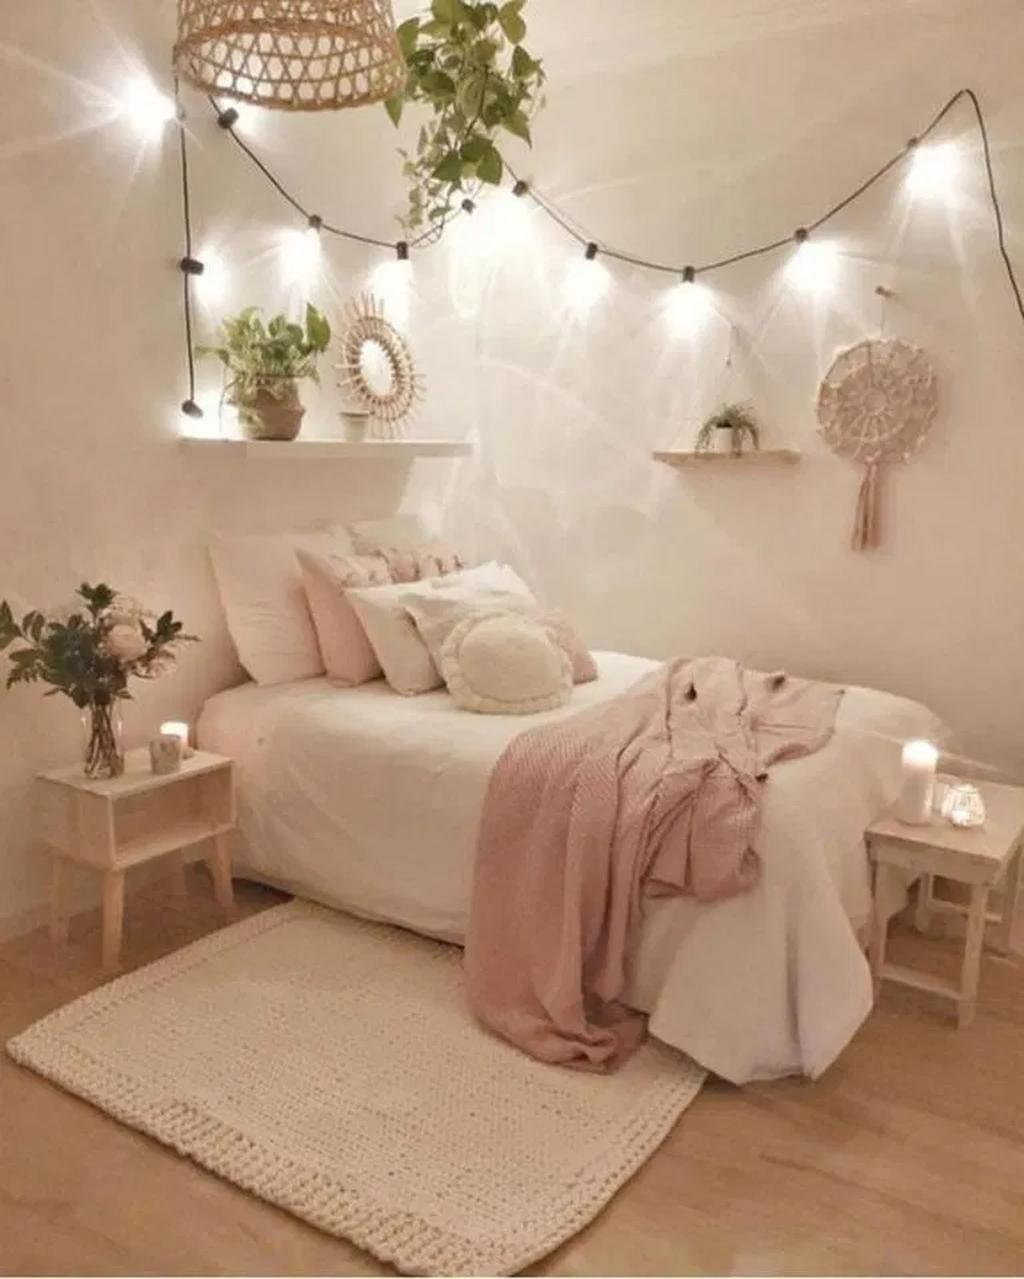 32 Fabulous Small Apartment Bedroom Design Ideas Homyhomee Small Apartment Bedrooms Apartment Bedroom Design Small Room Bedroom